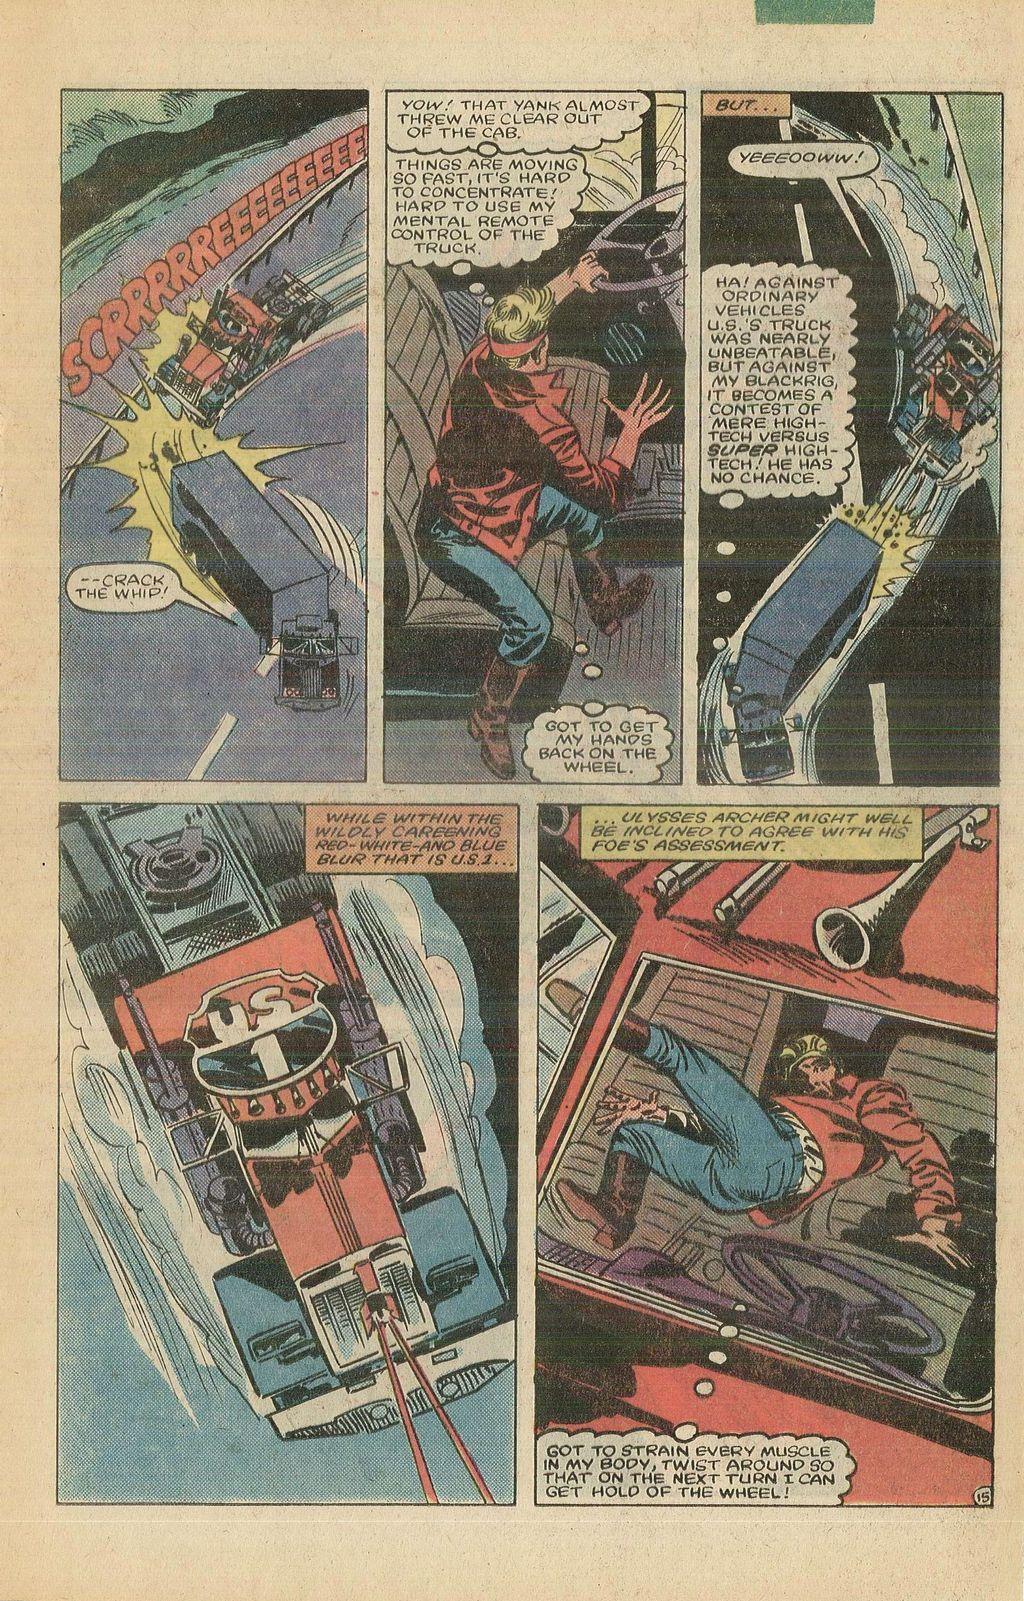 Read online U.S. 1 comic -  Issue #10 - 21